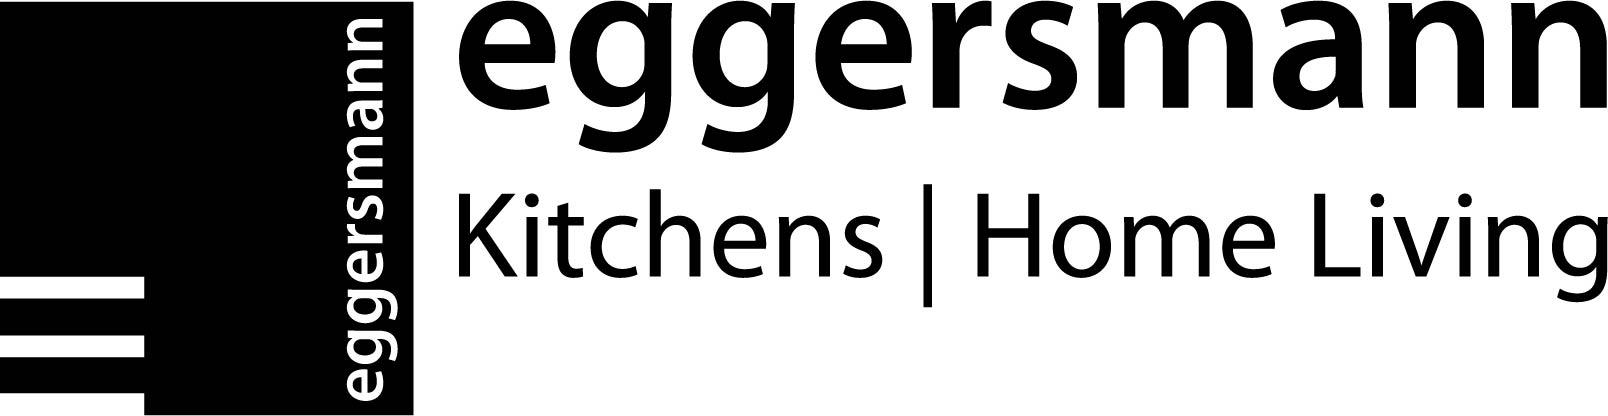 2019 Home Tour- Eggersmann logo